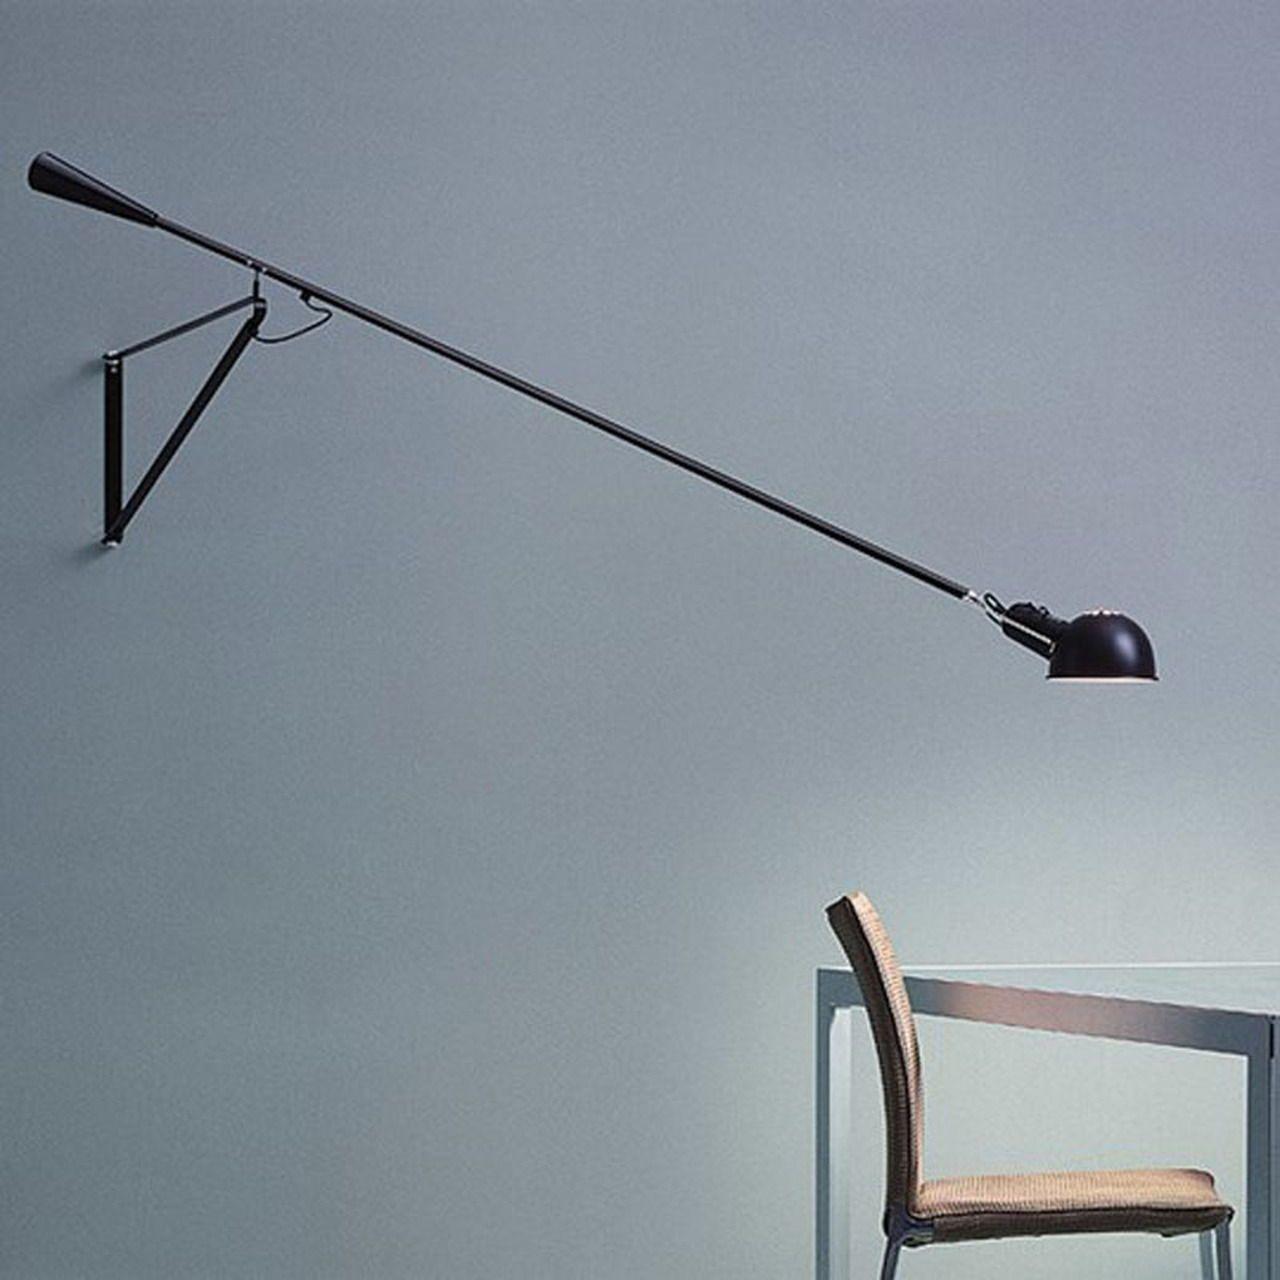 265 Swing Arm Wall Lamp Wall Lamp 265 Wall Lamp Swing Arm Wall Lamps